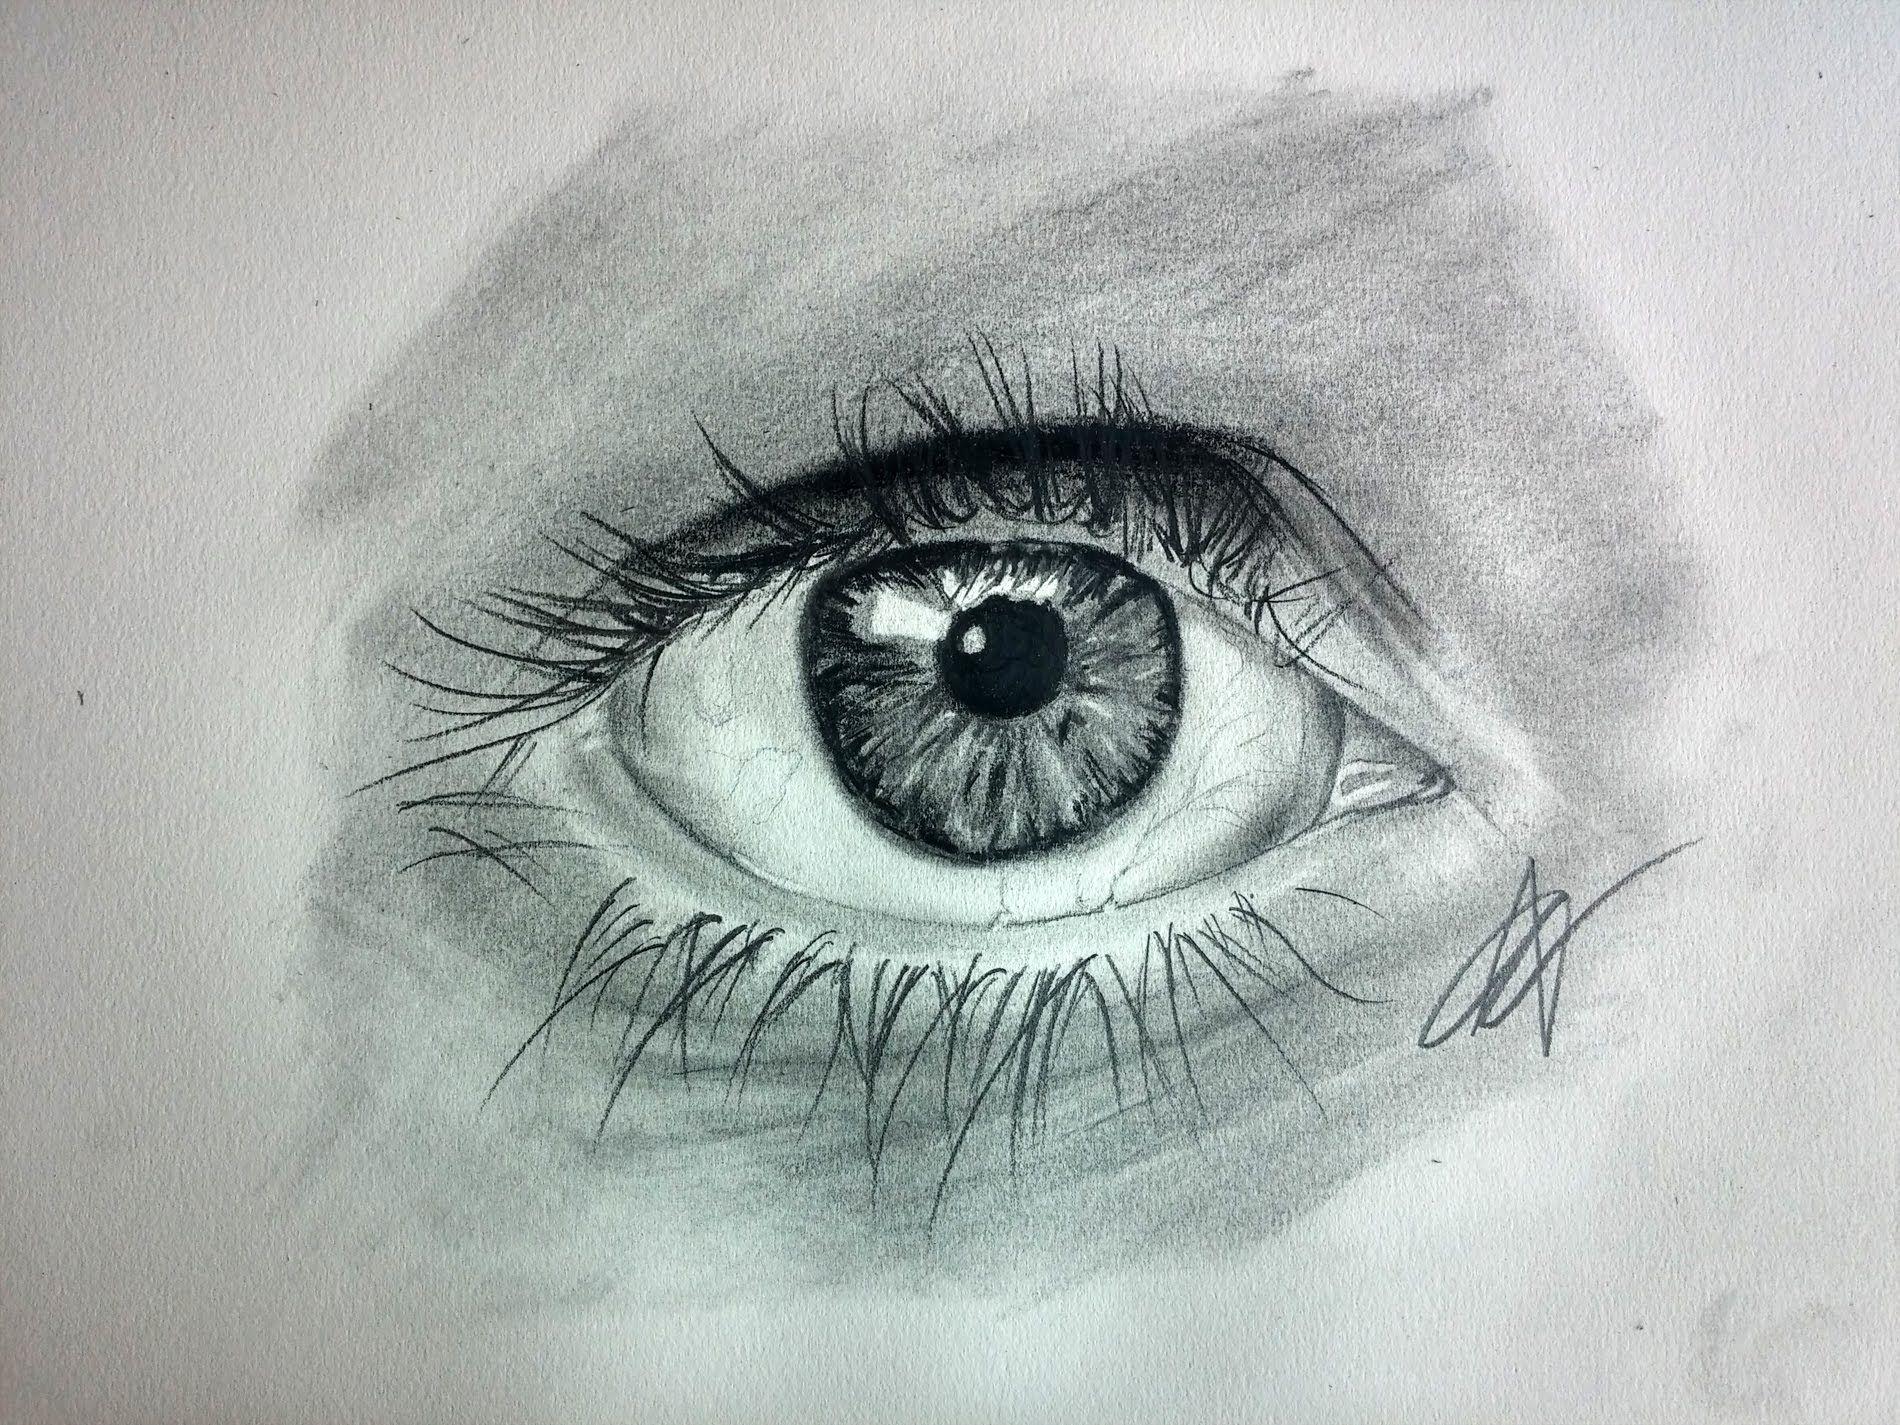 Como Dibujar Un Ojo Realista Paso A Paso Dibujos Ojo Realista